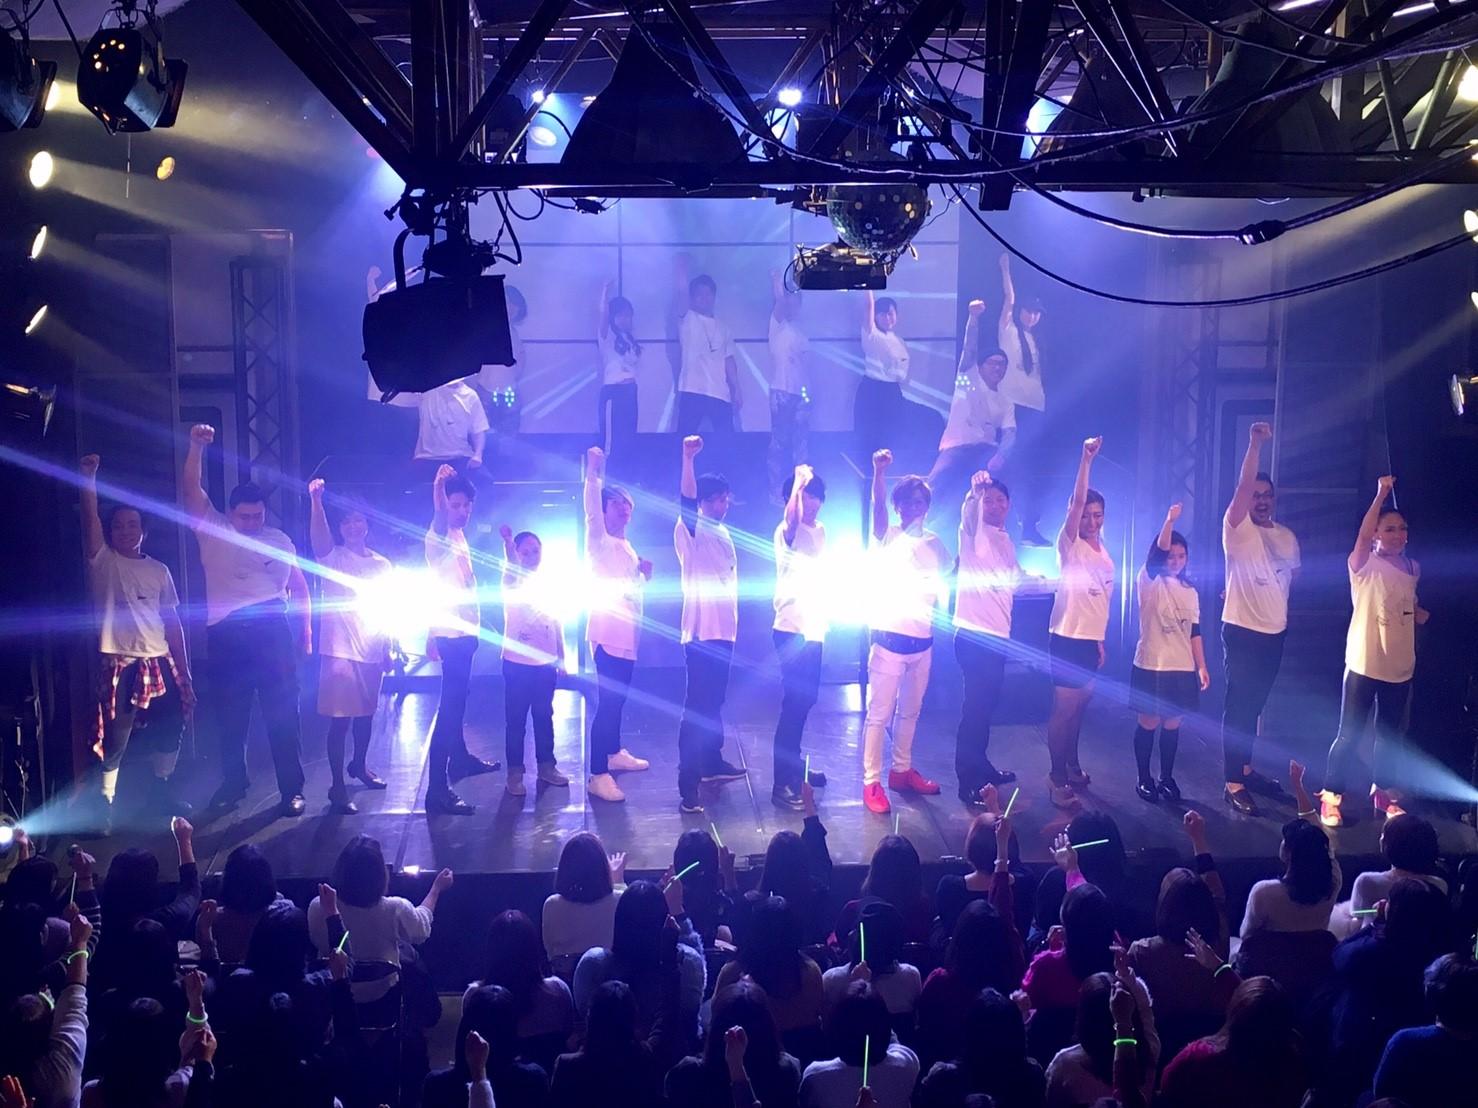 「BELIEVE」MUSICAL LIVE&TALK〜DVD発売記念スペシャルイベント〜